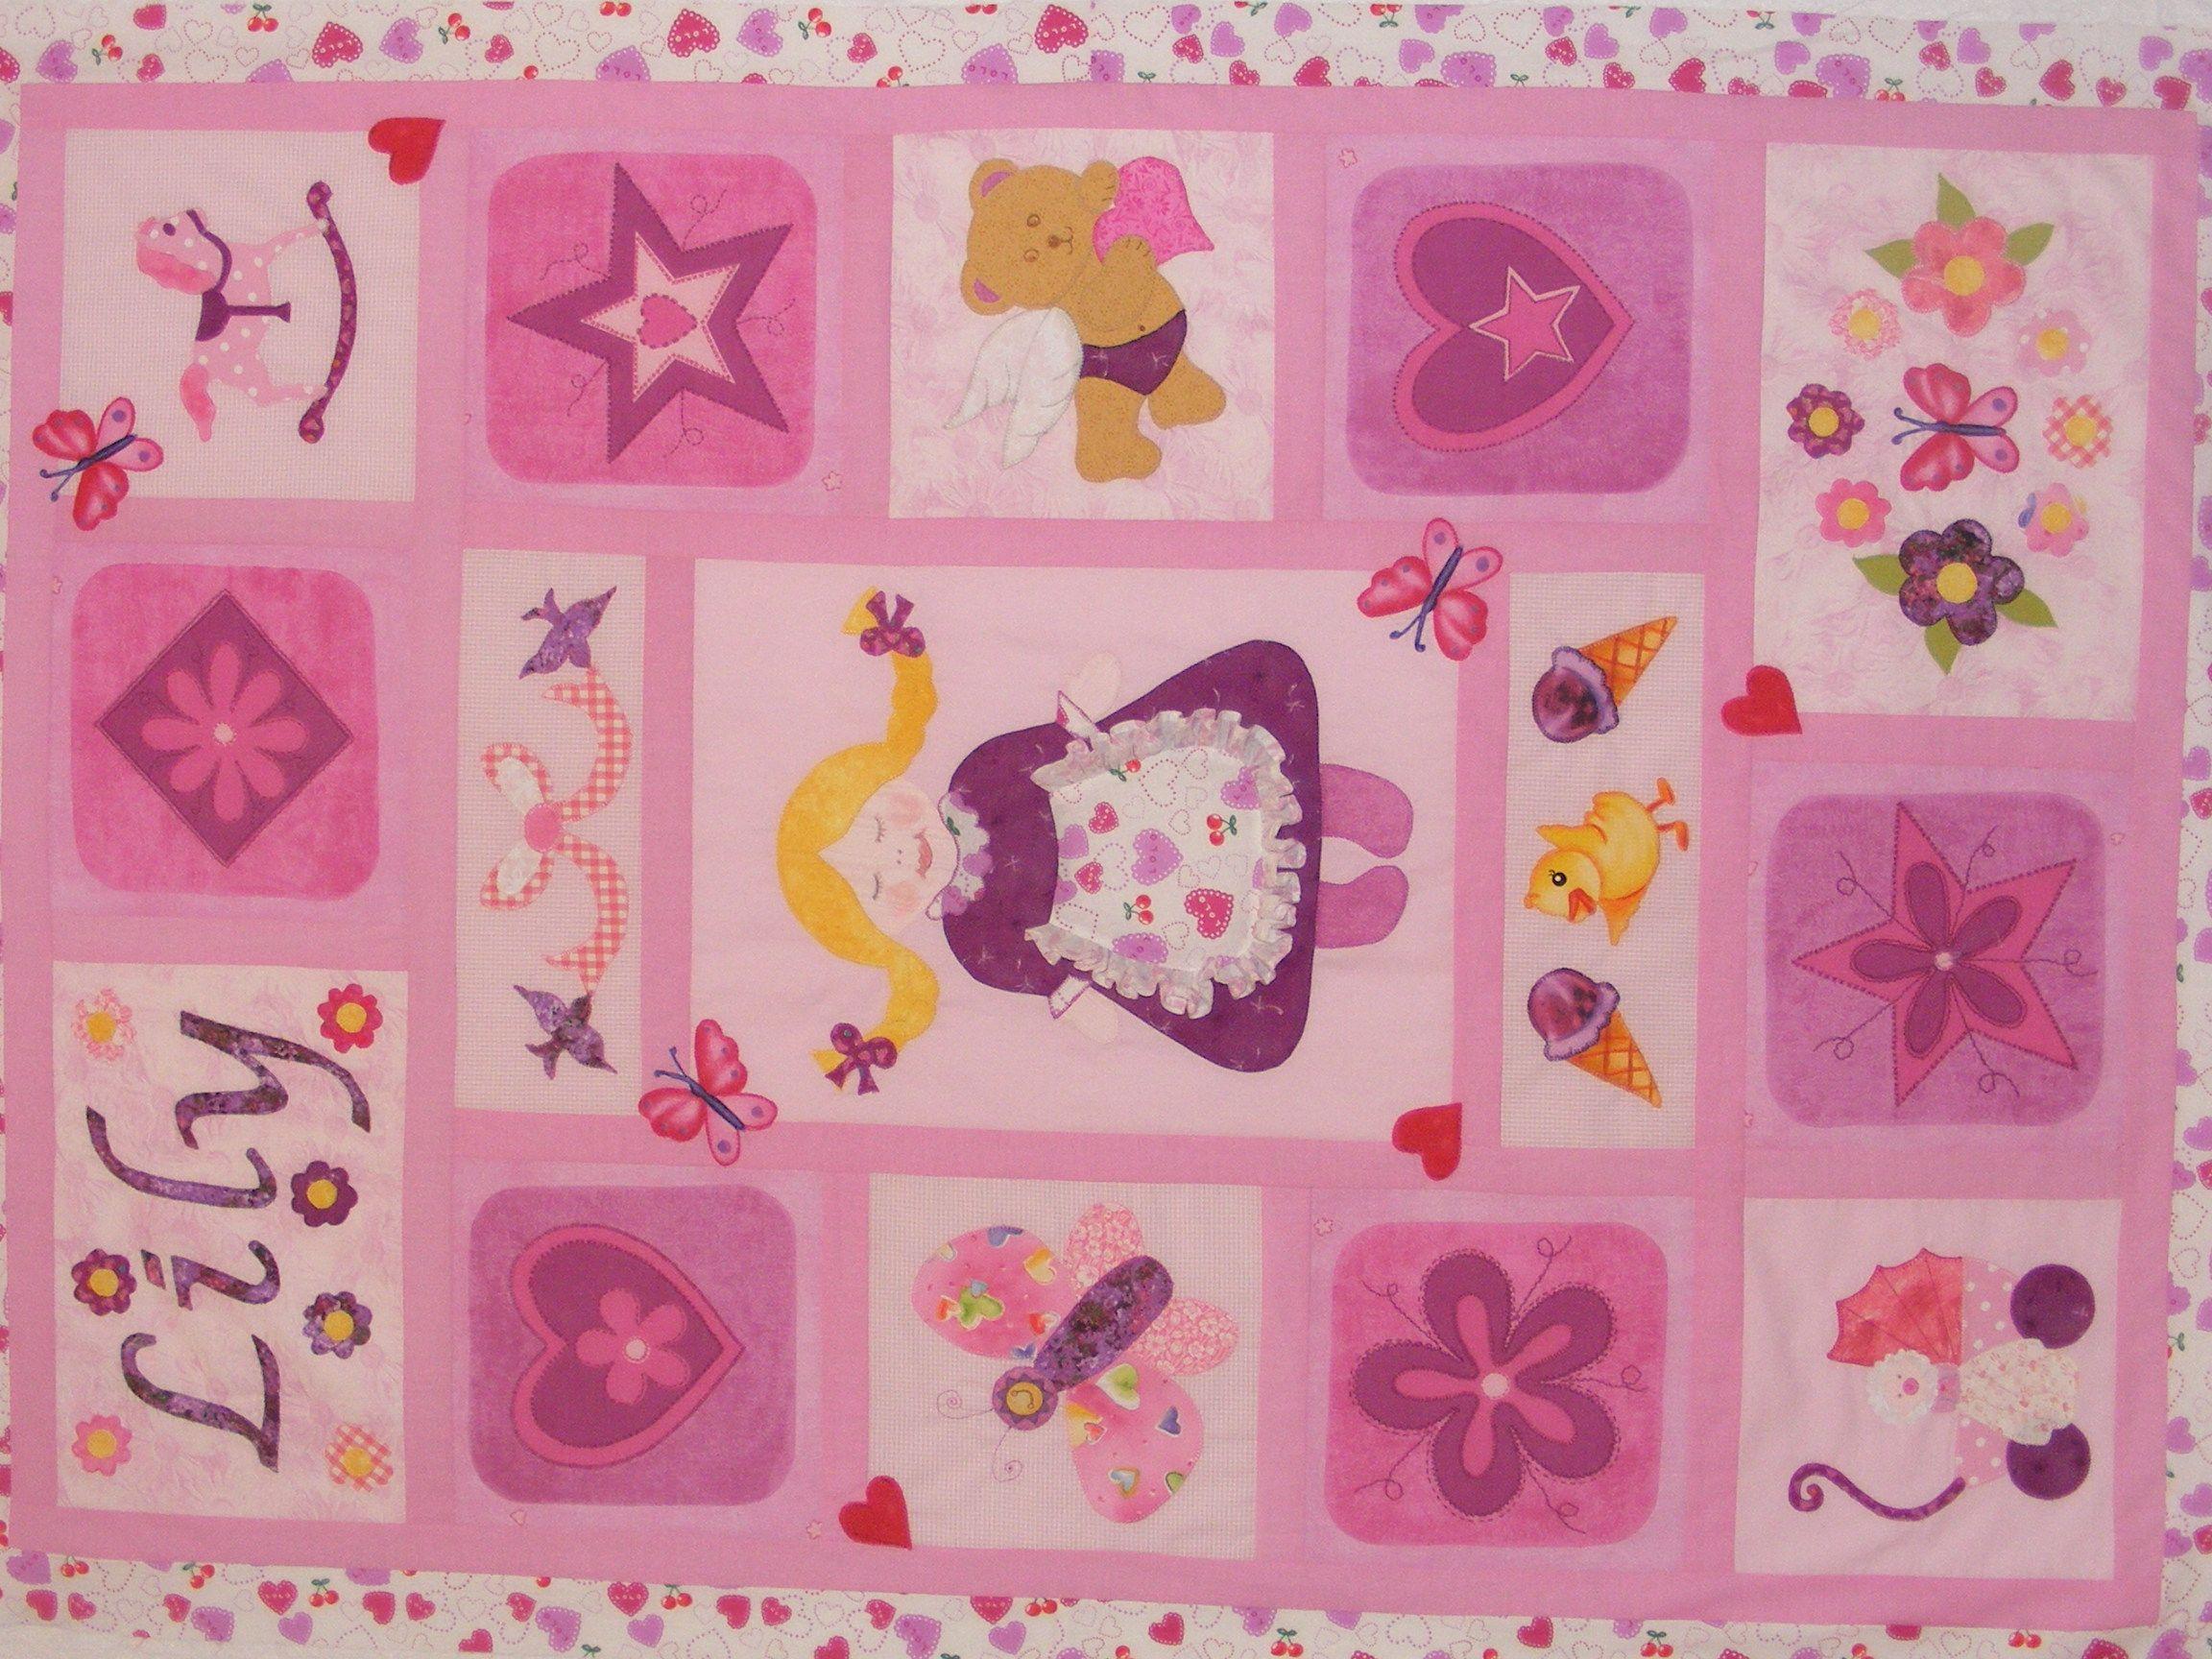 Own design applique little girl quilt!